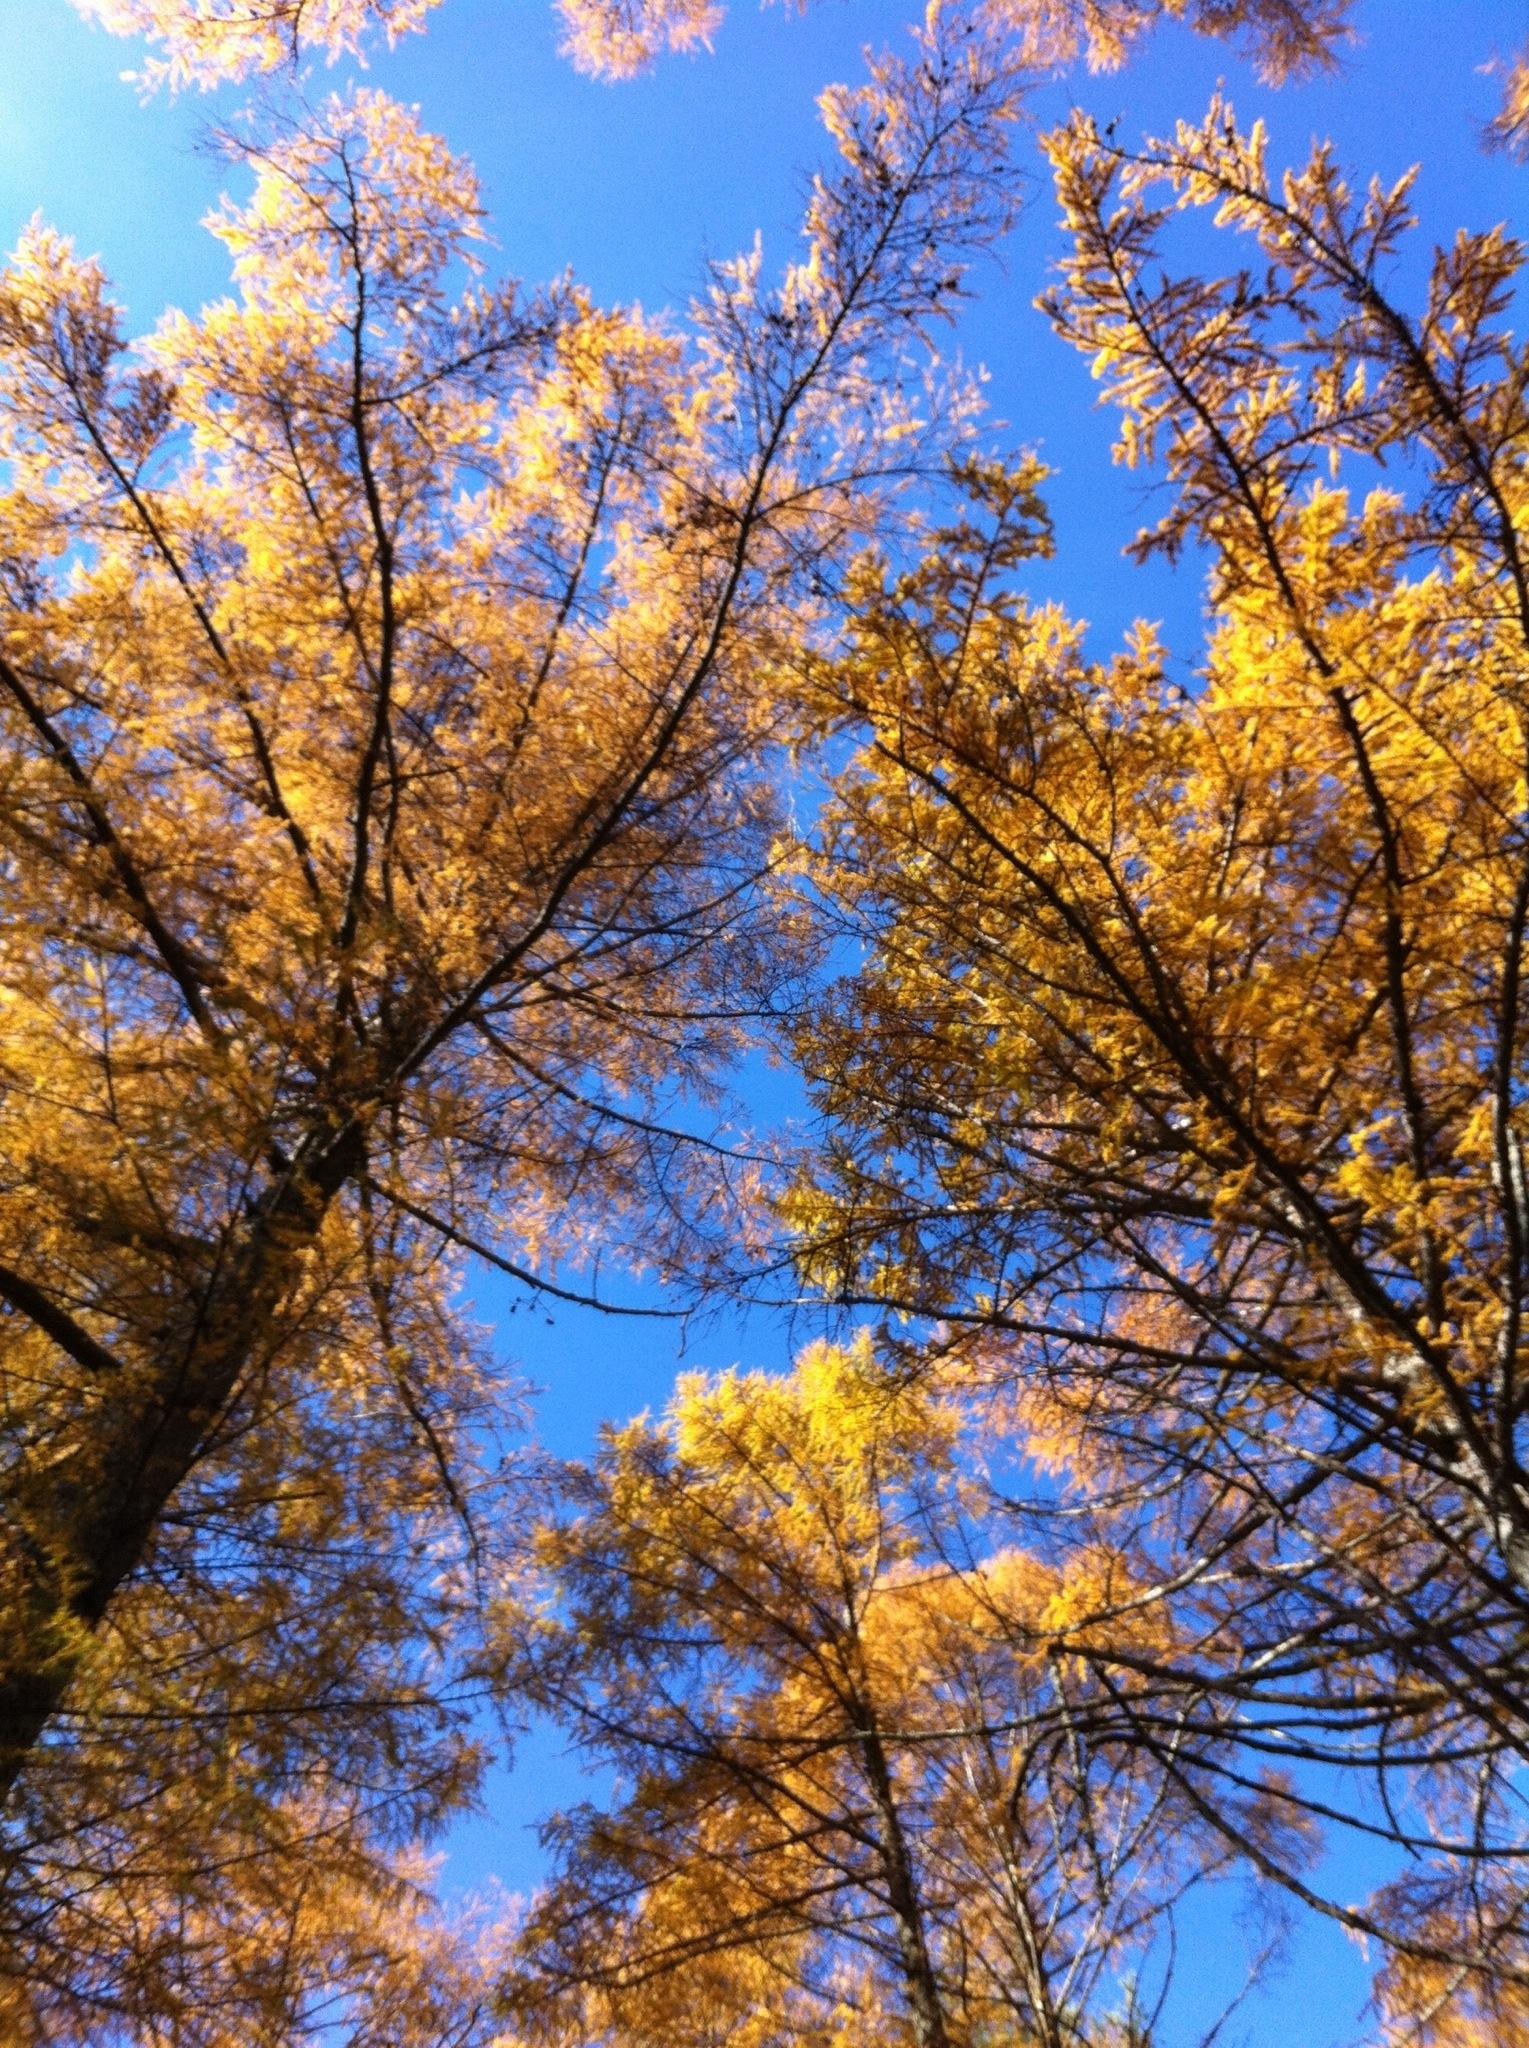 11月12日軽井沢の紅葉。20131112-105135.jpg